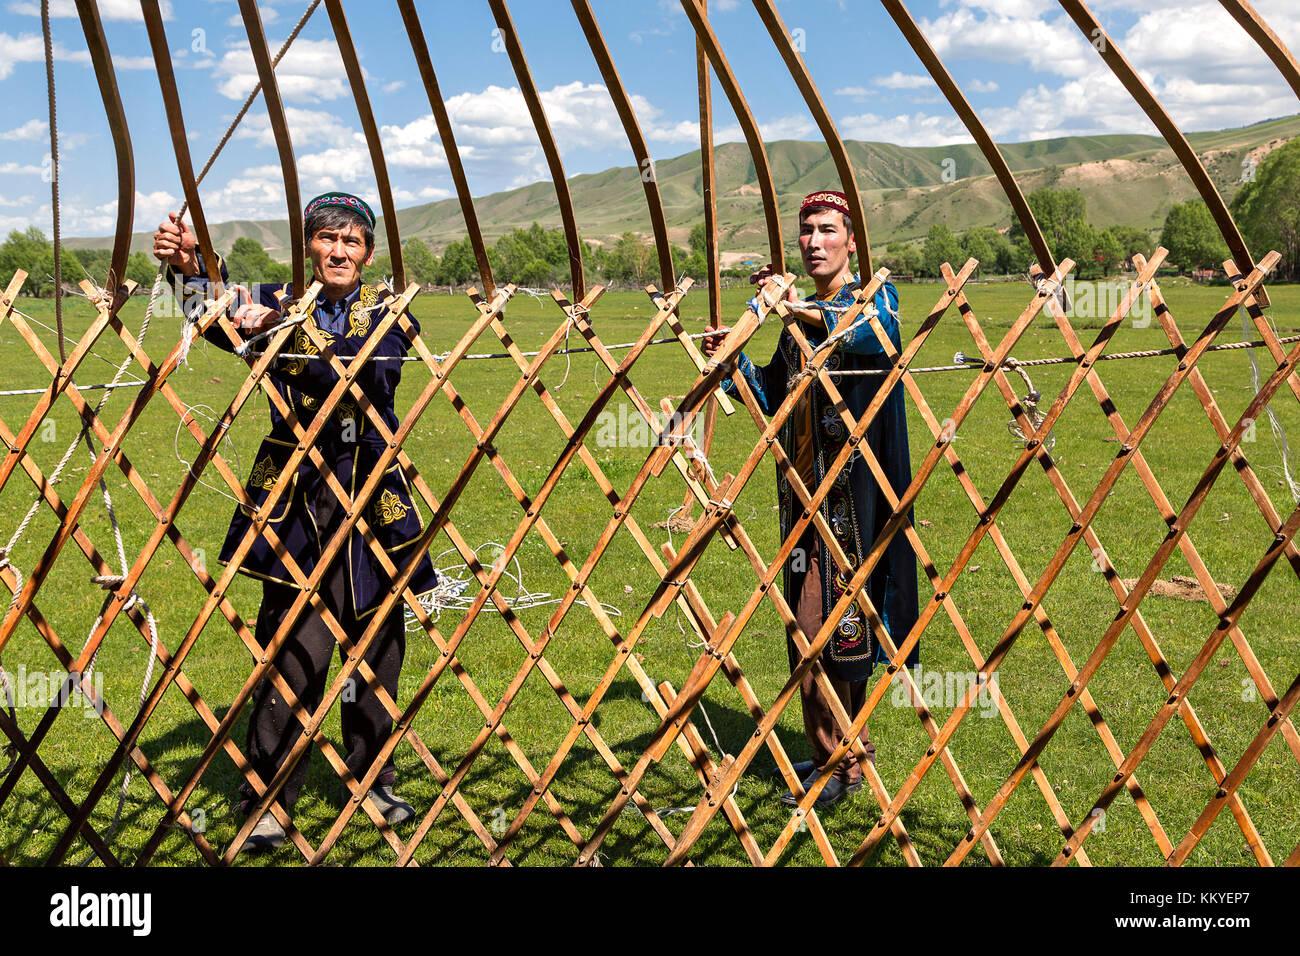 Kazakh people building a nomadic tent known as yurt, in Saty Village, Kazakhstan. - Stock Image